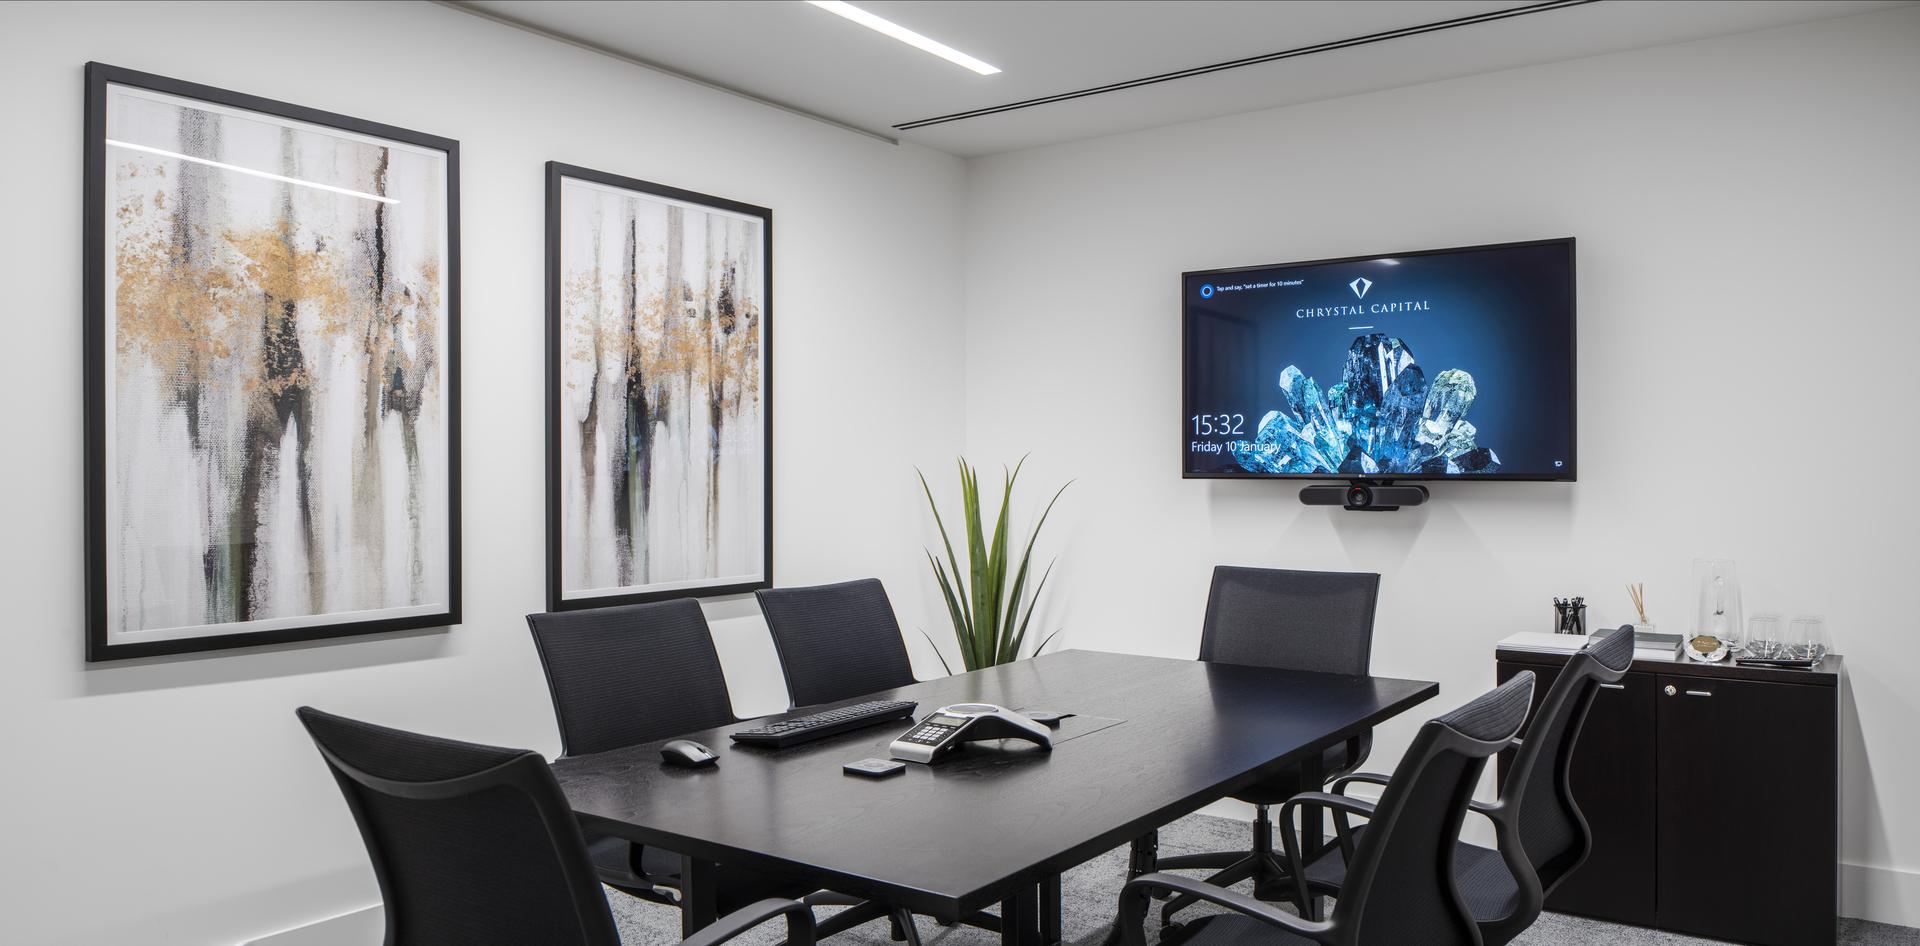 Chrystal Capital Meeting Room